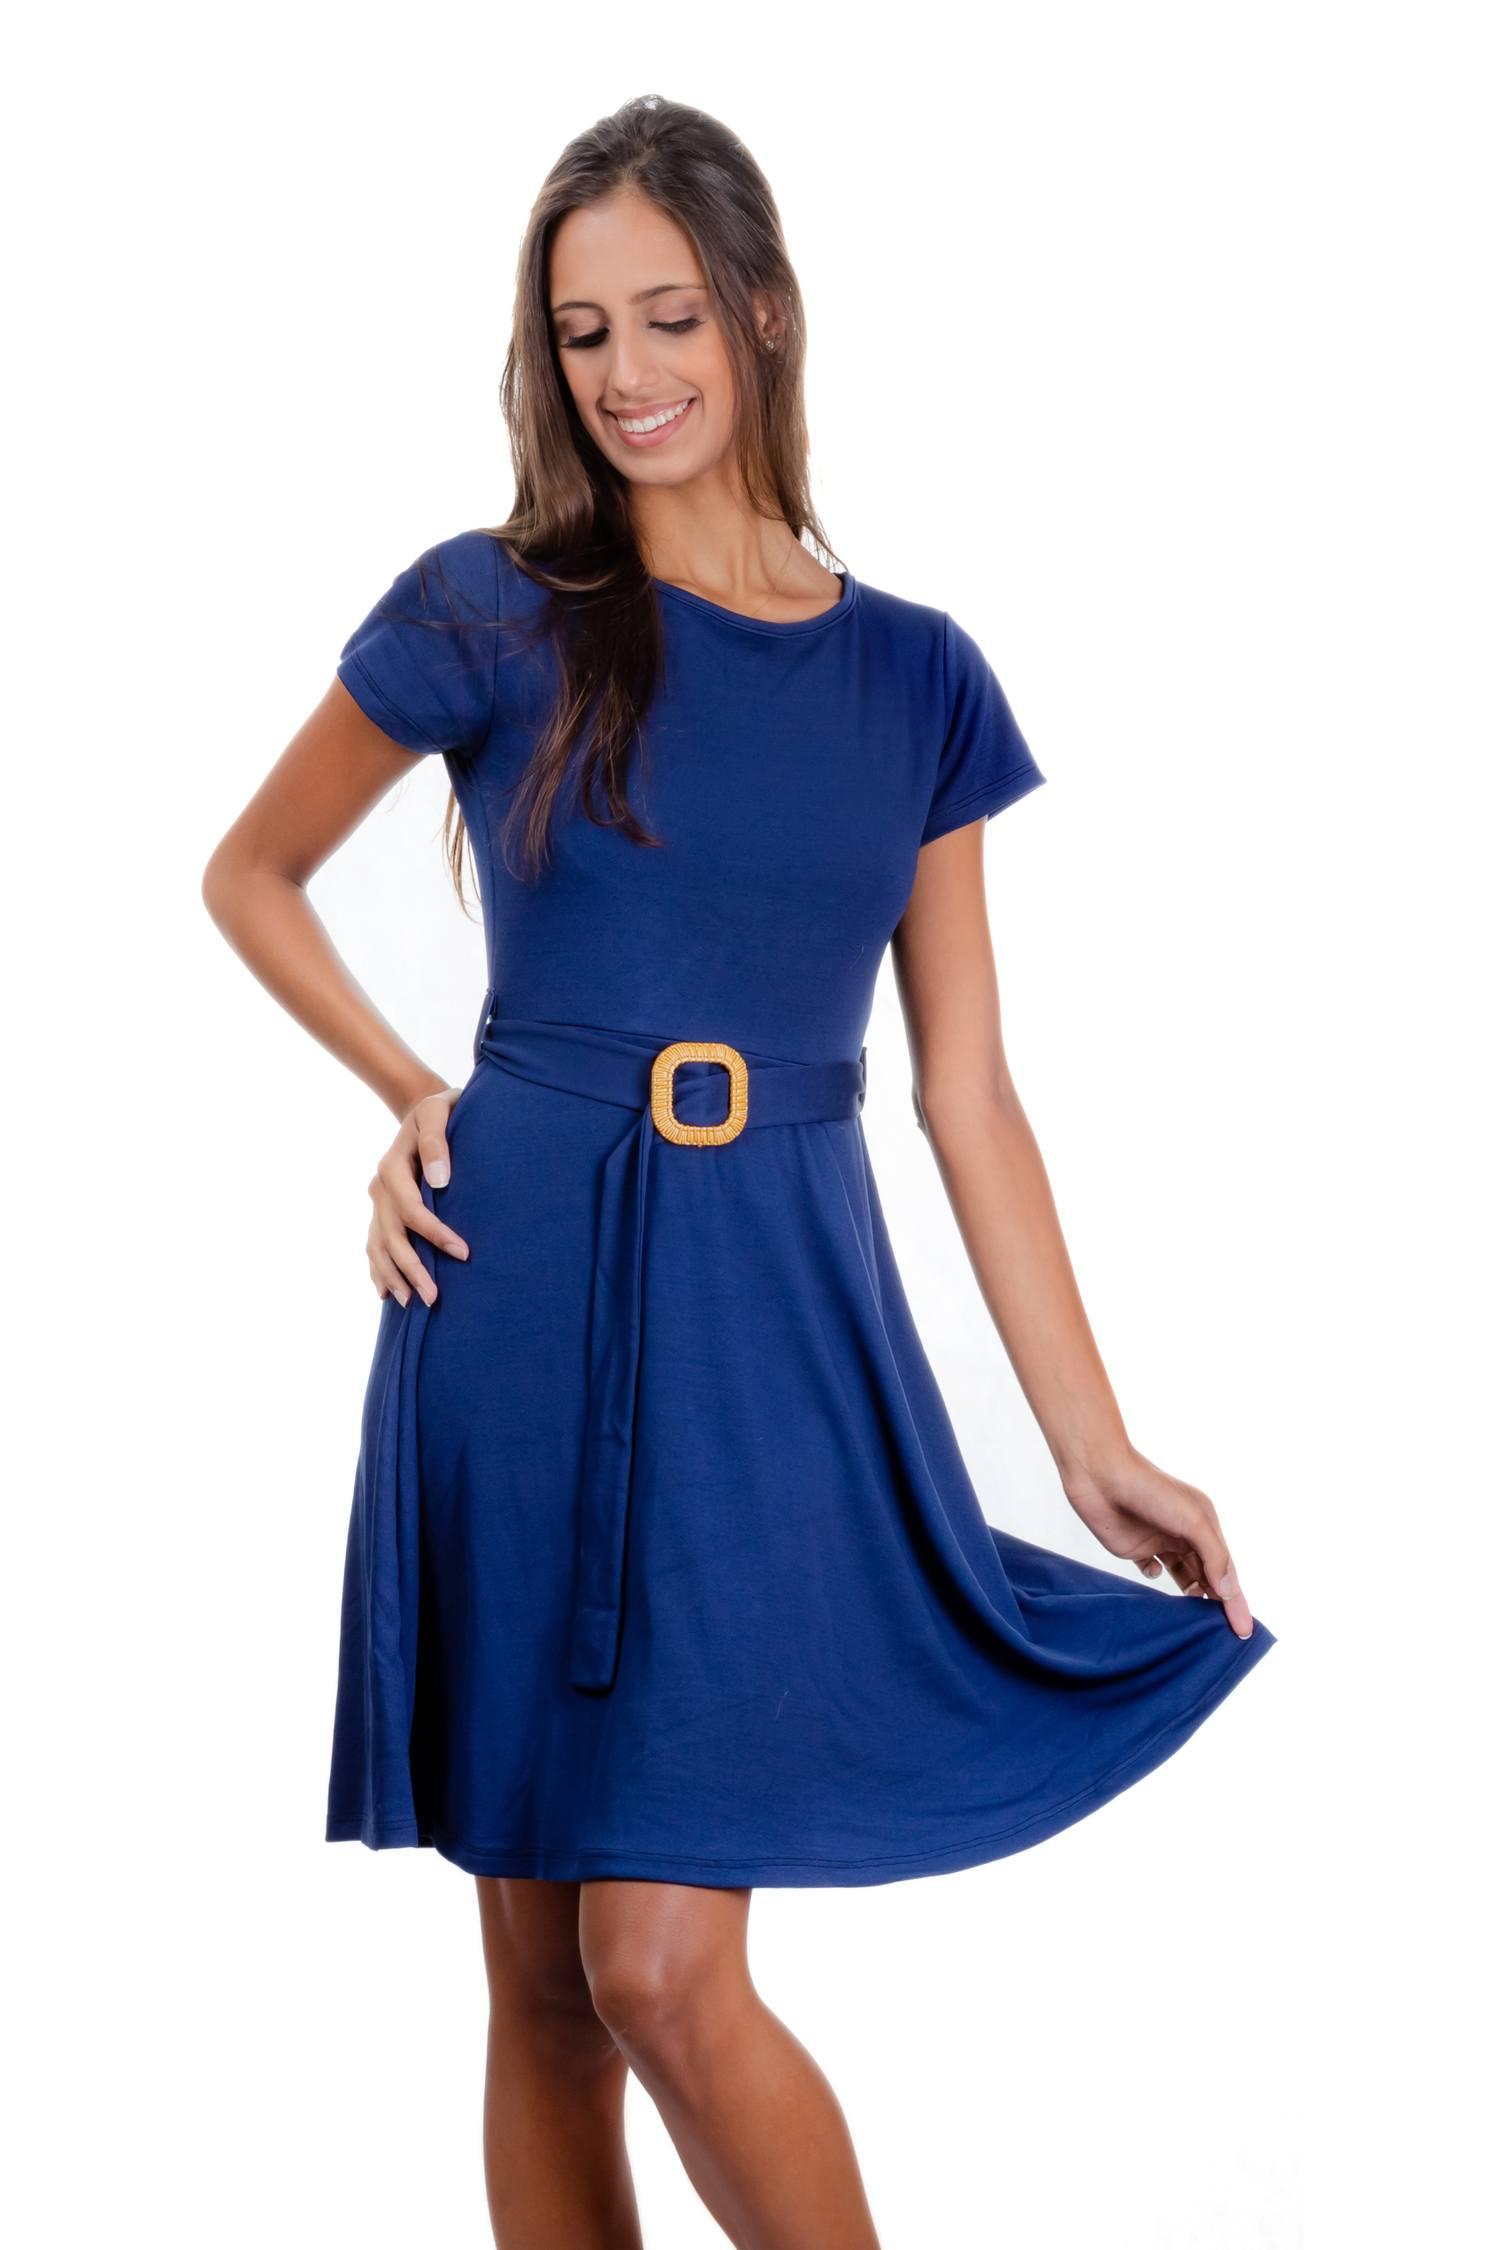 Vestido em Malha com Elastano - Stella Ref. 3780